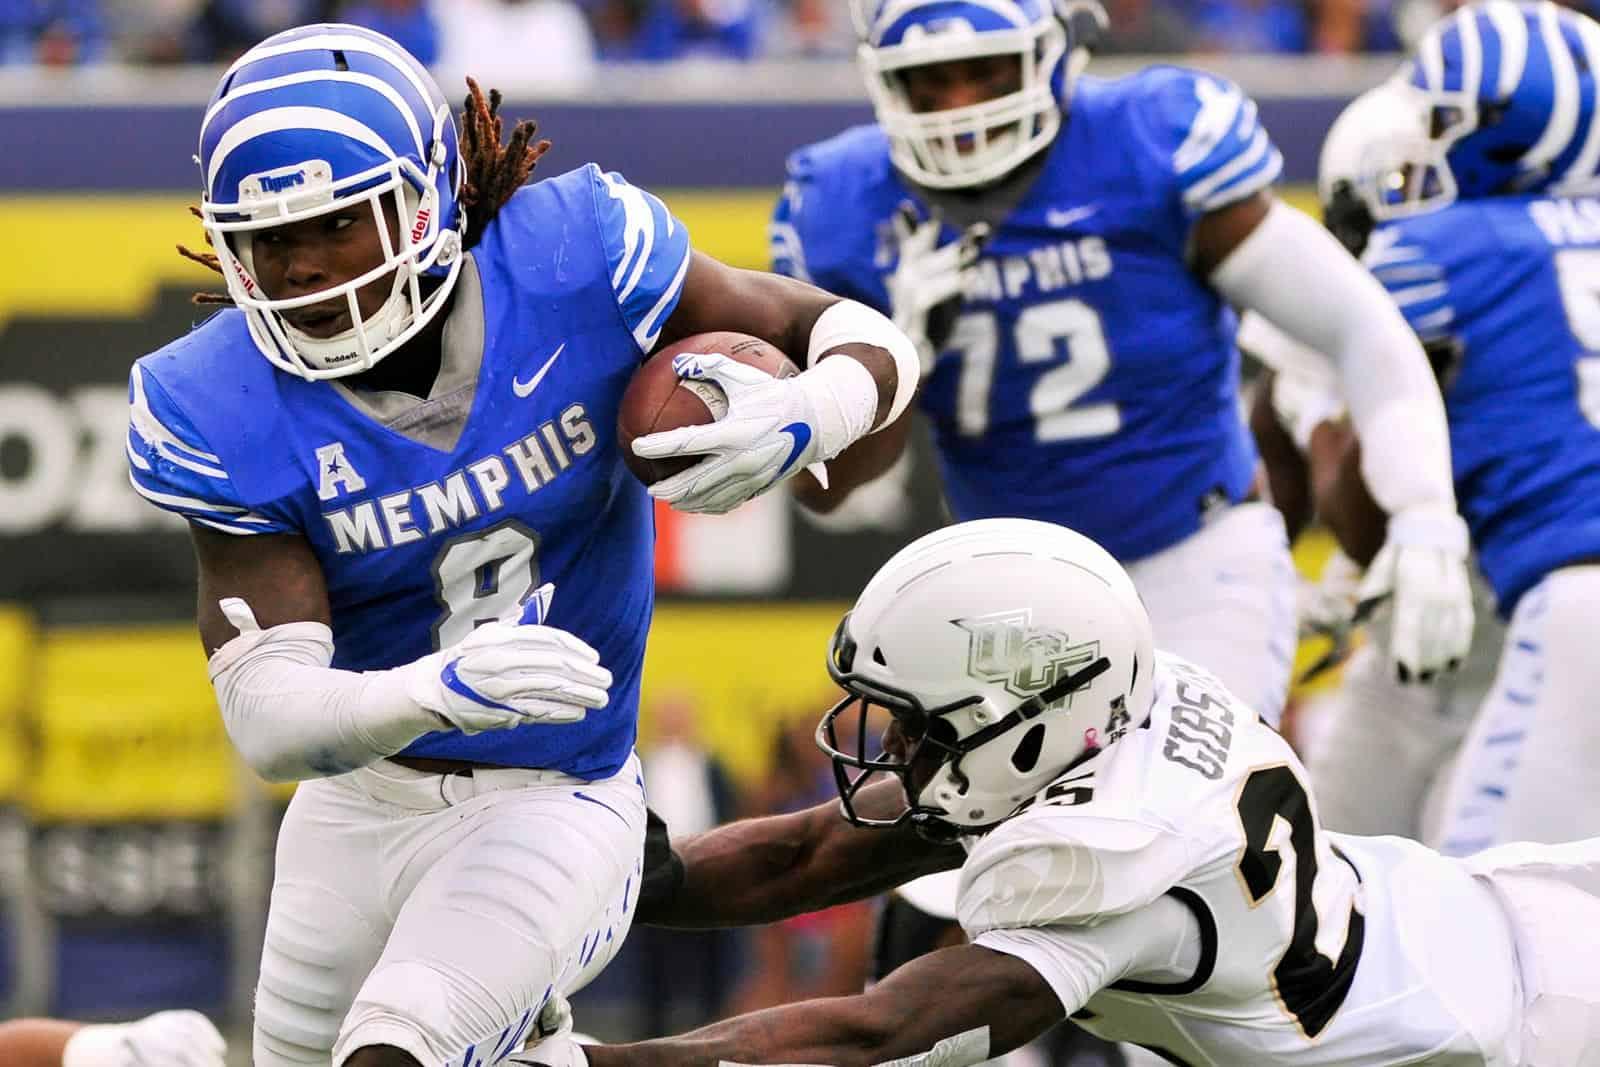 2018 American Football Championship Game Memphis At Ucf